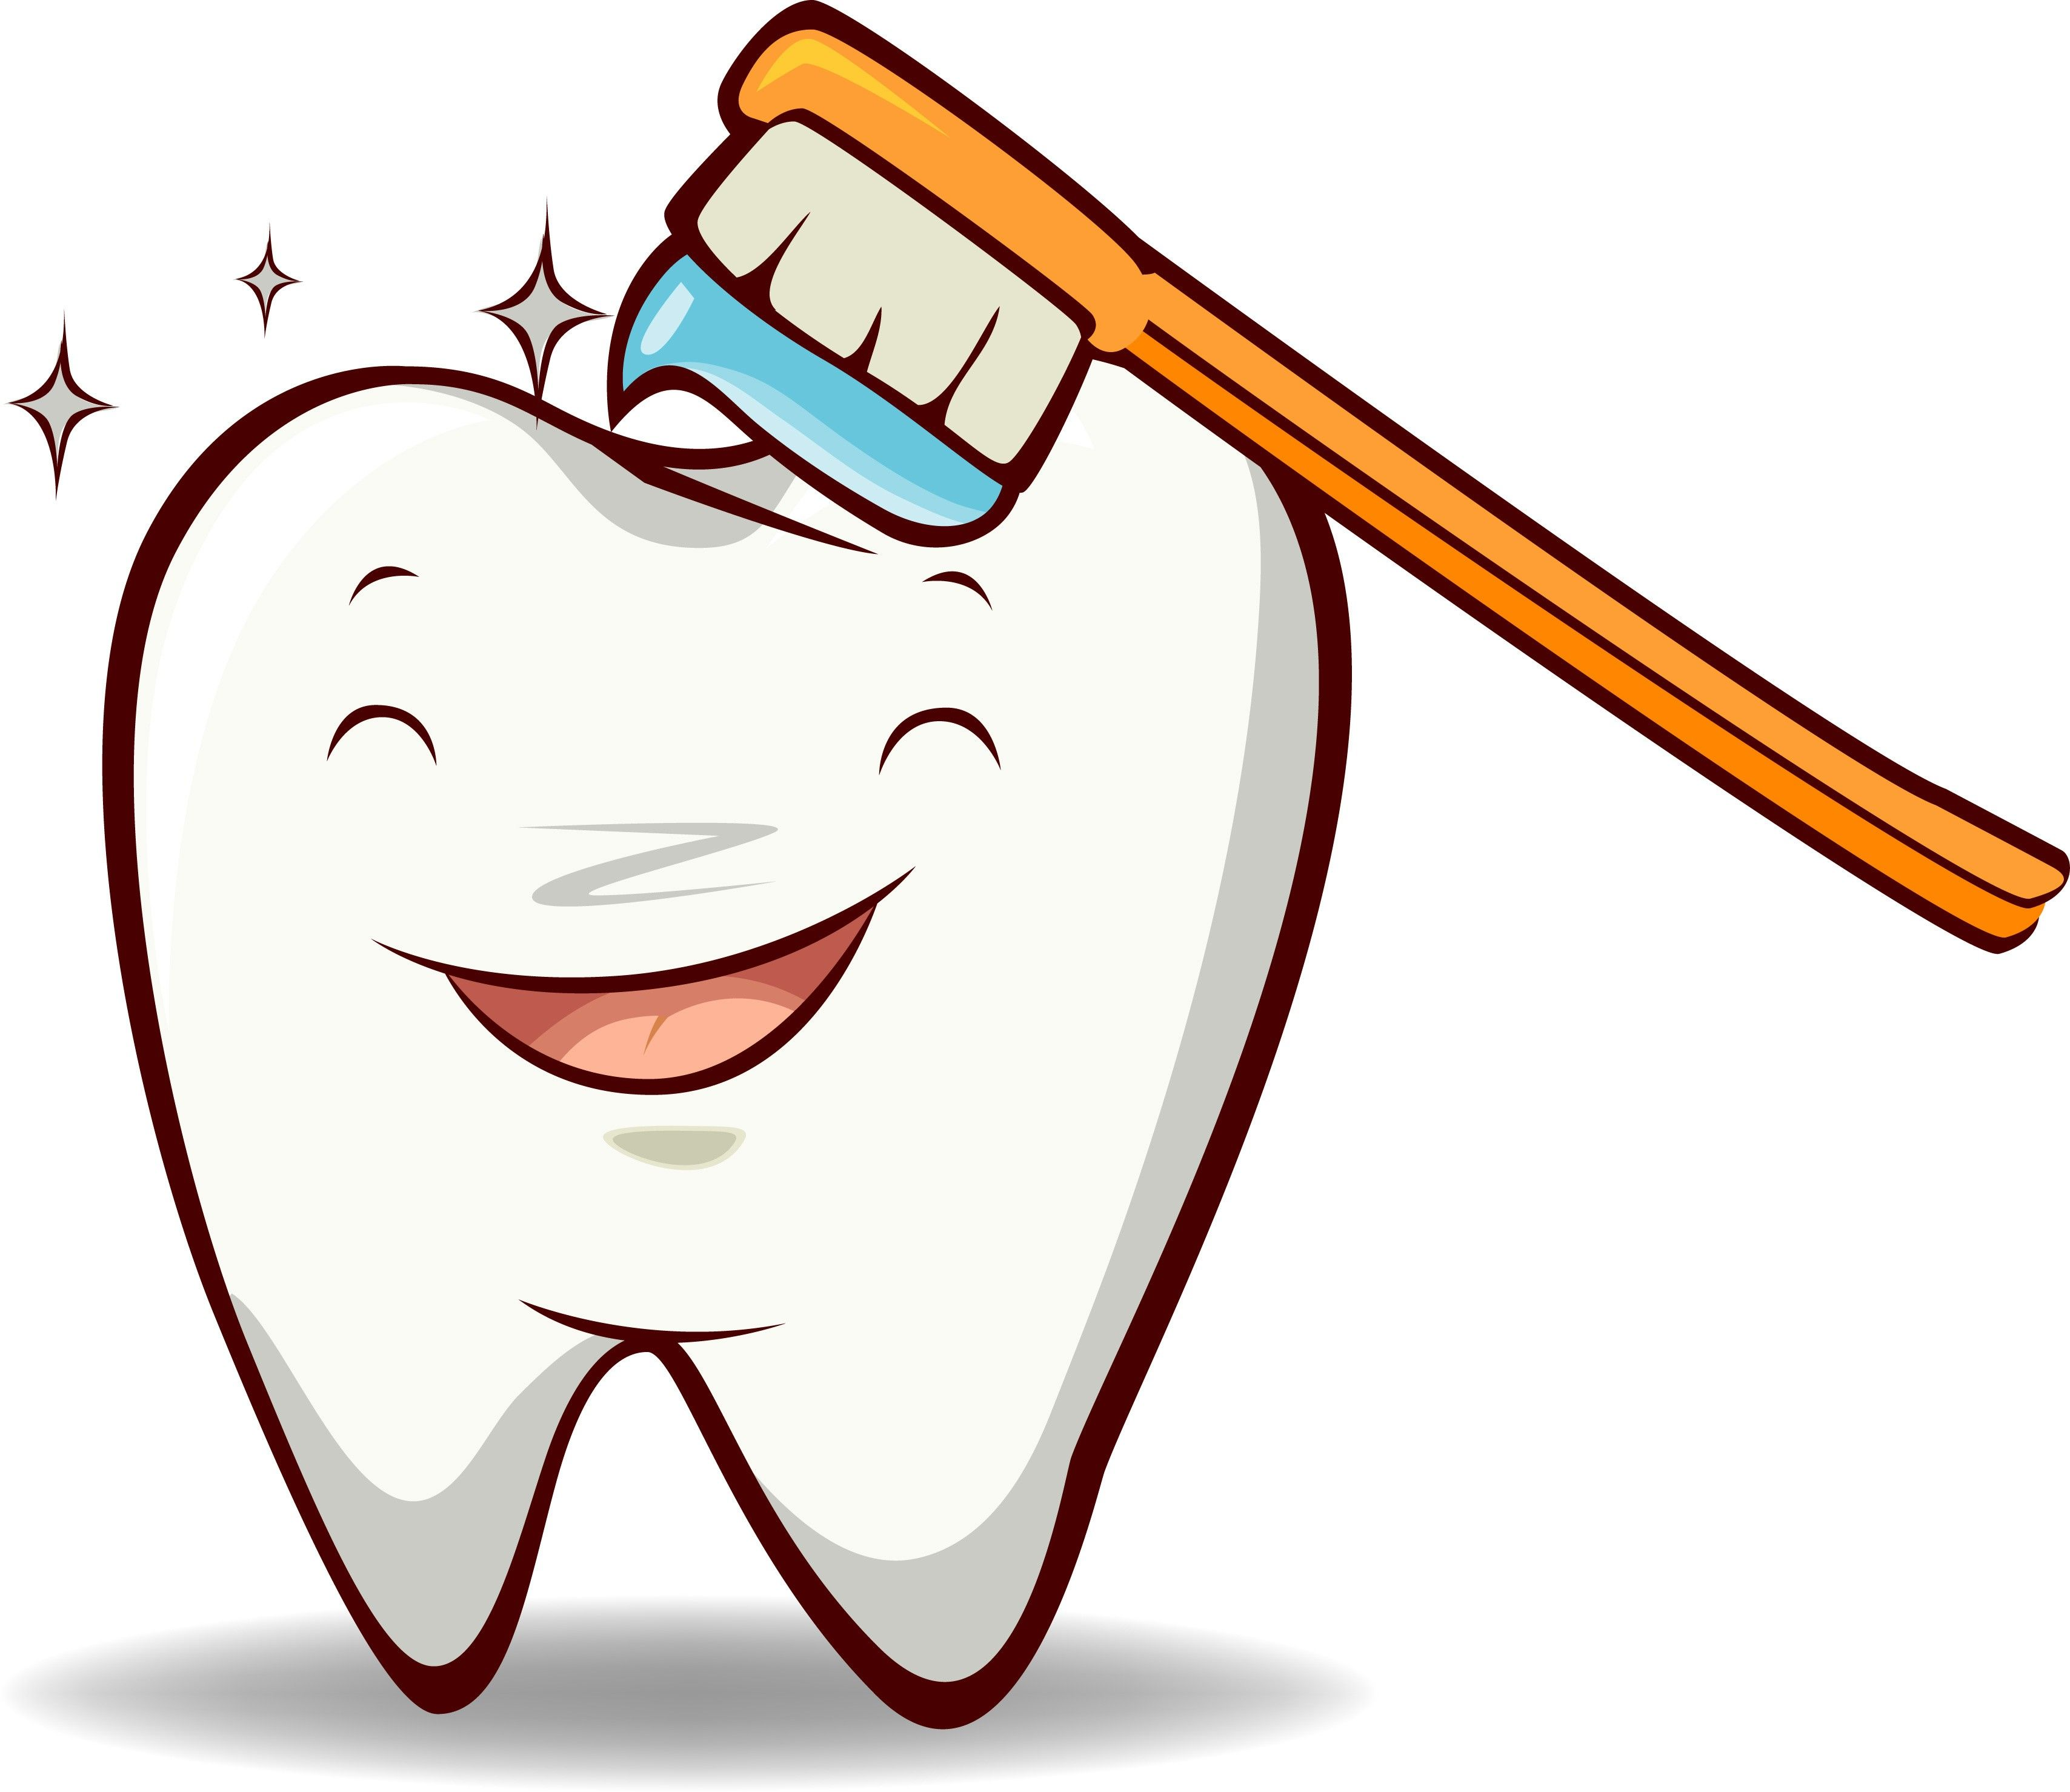 Tooth Clip Art Wallpaper Dental Art Pinterest Teeth